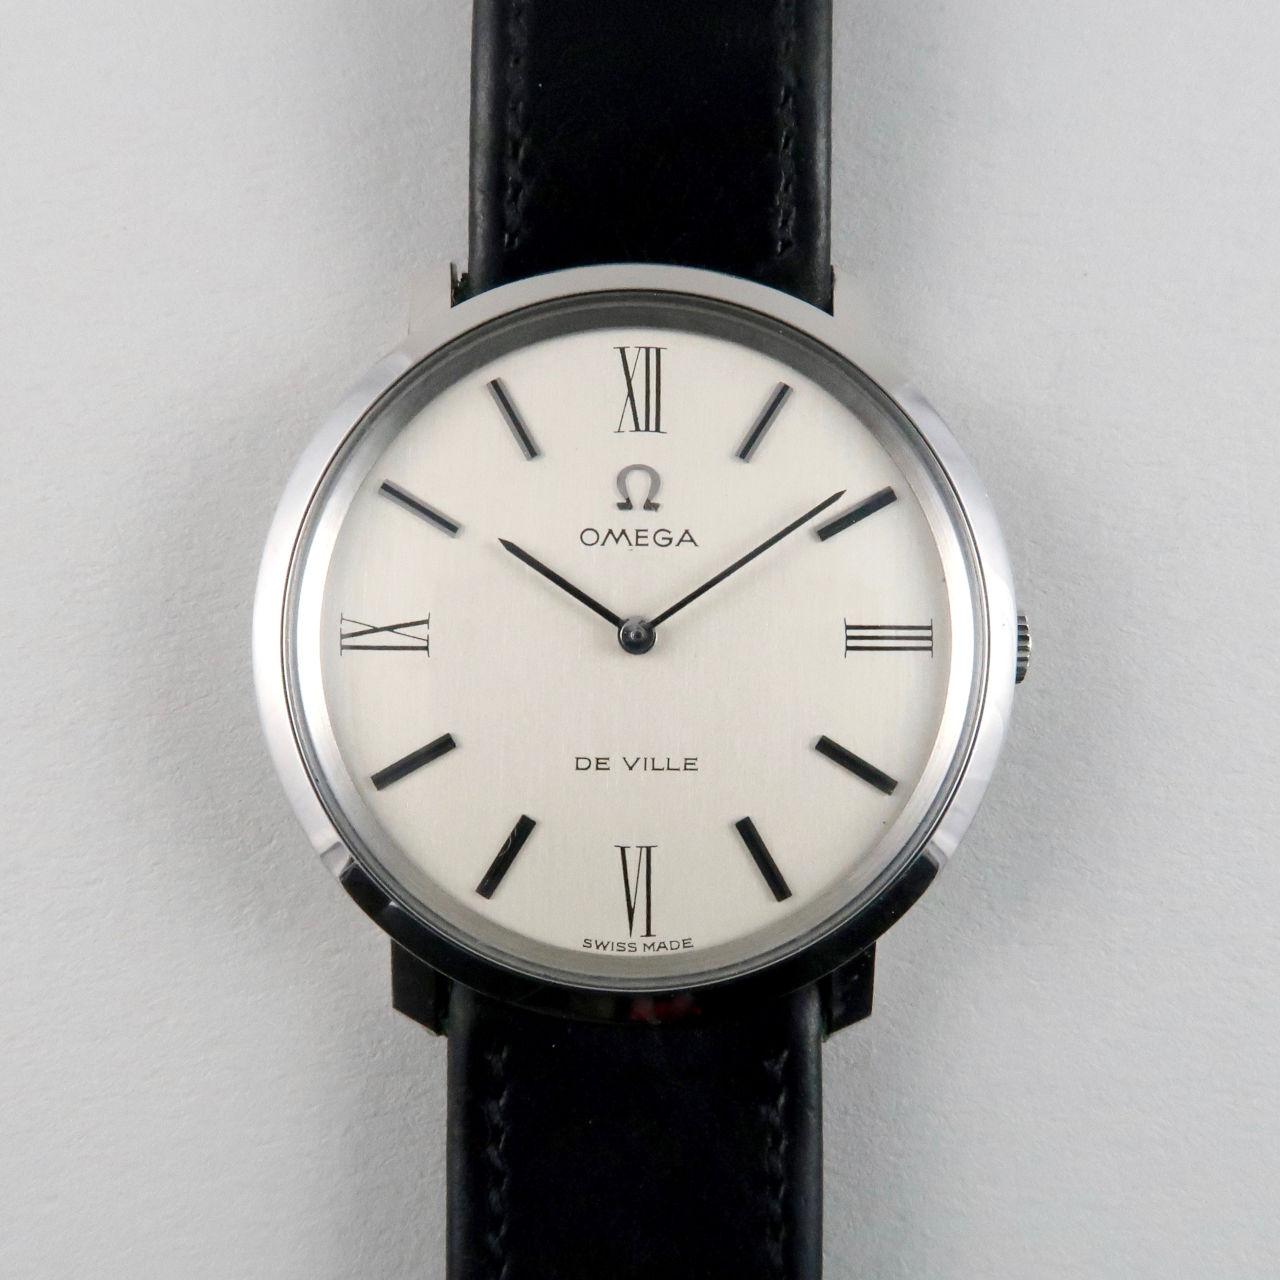 Omega de Ville Ref. 111.077 steel vintage wristwatch, circa 1968